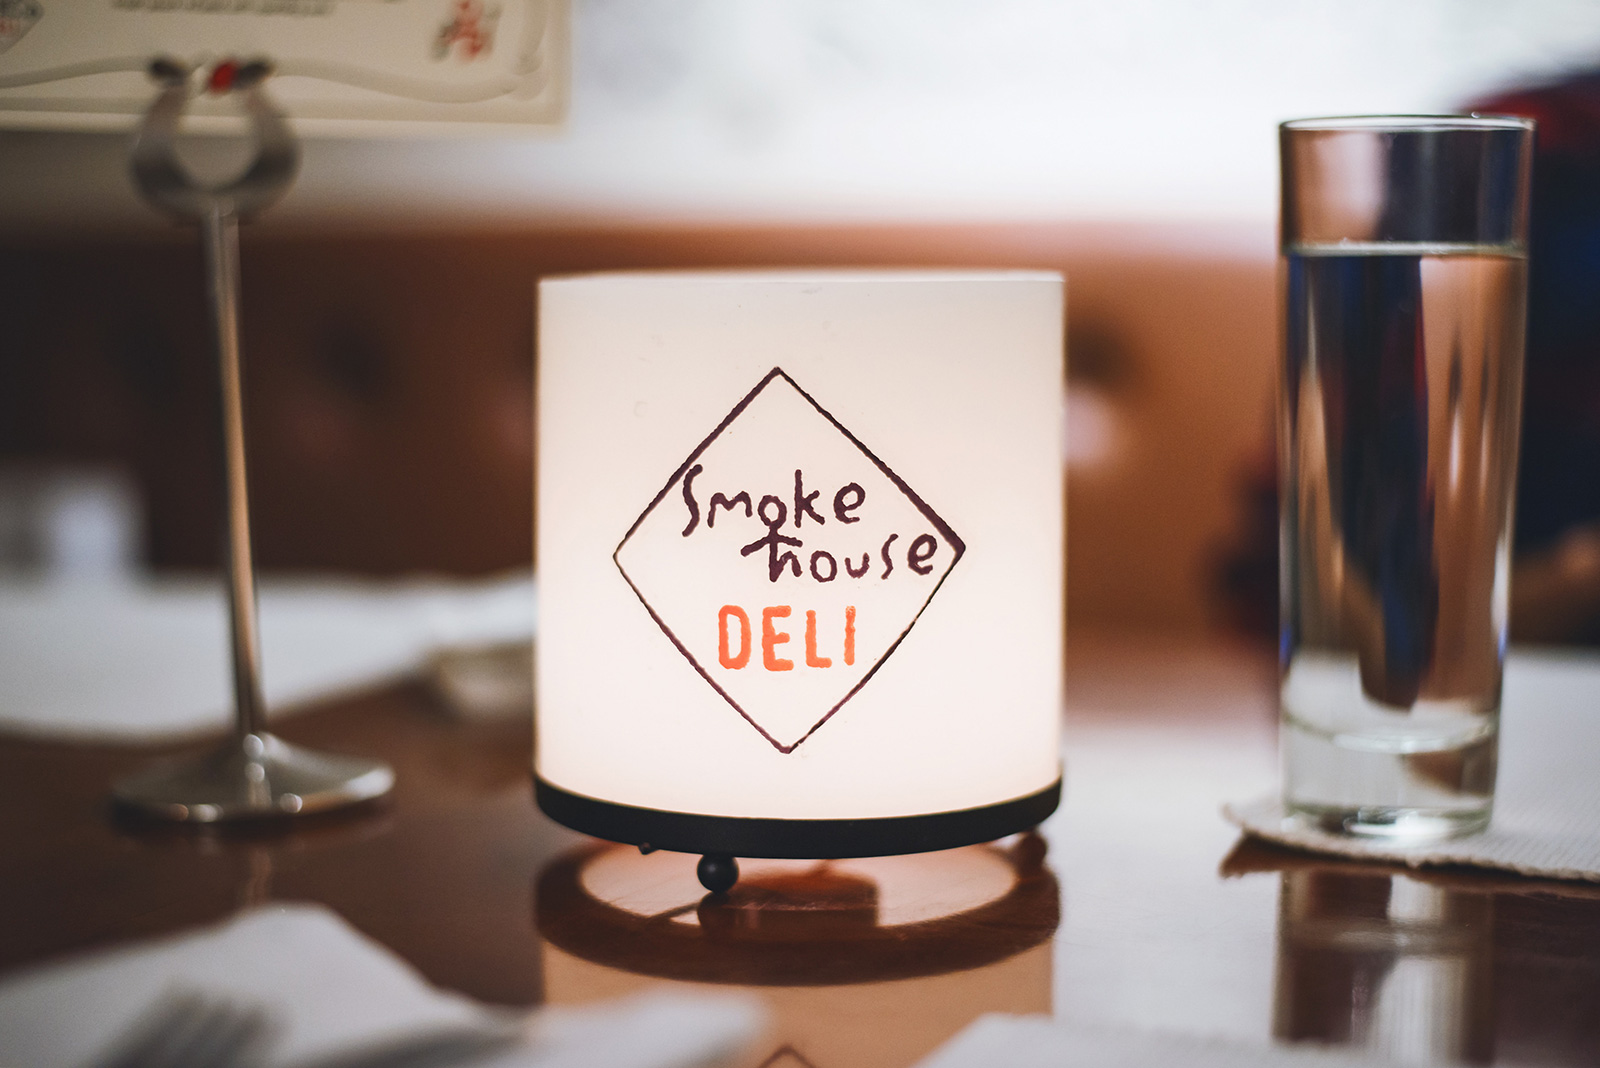 Smokehouse-Deli-2